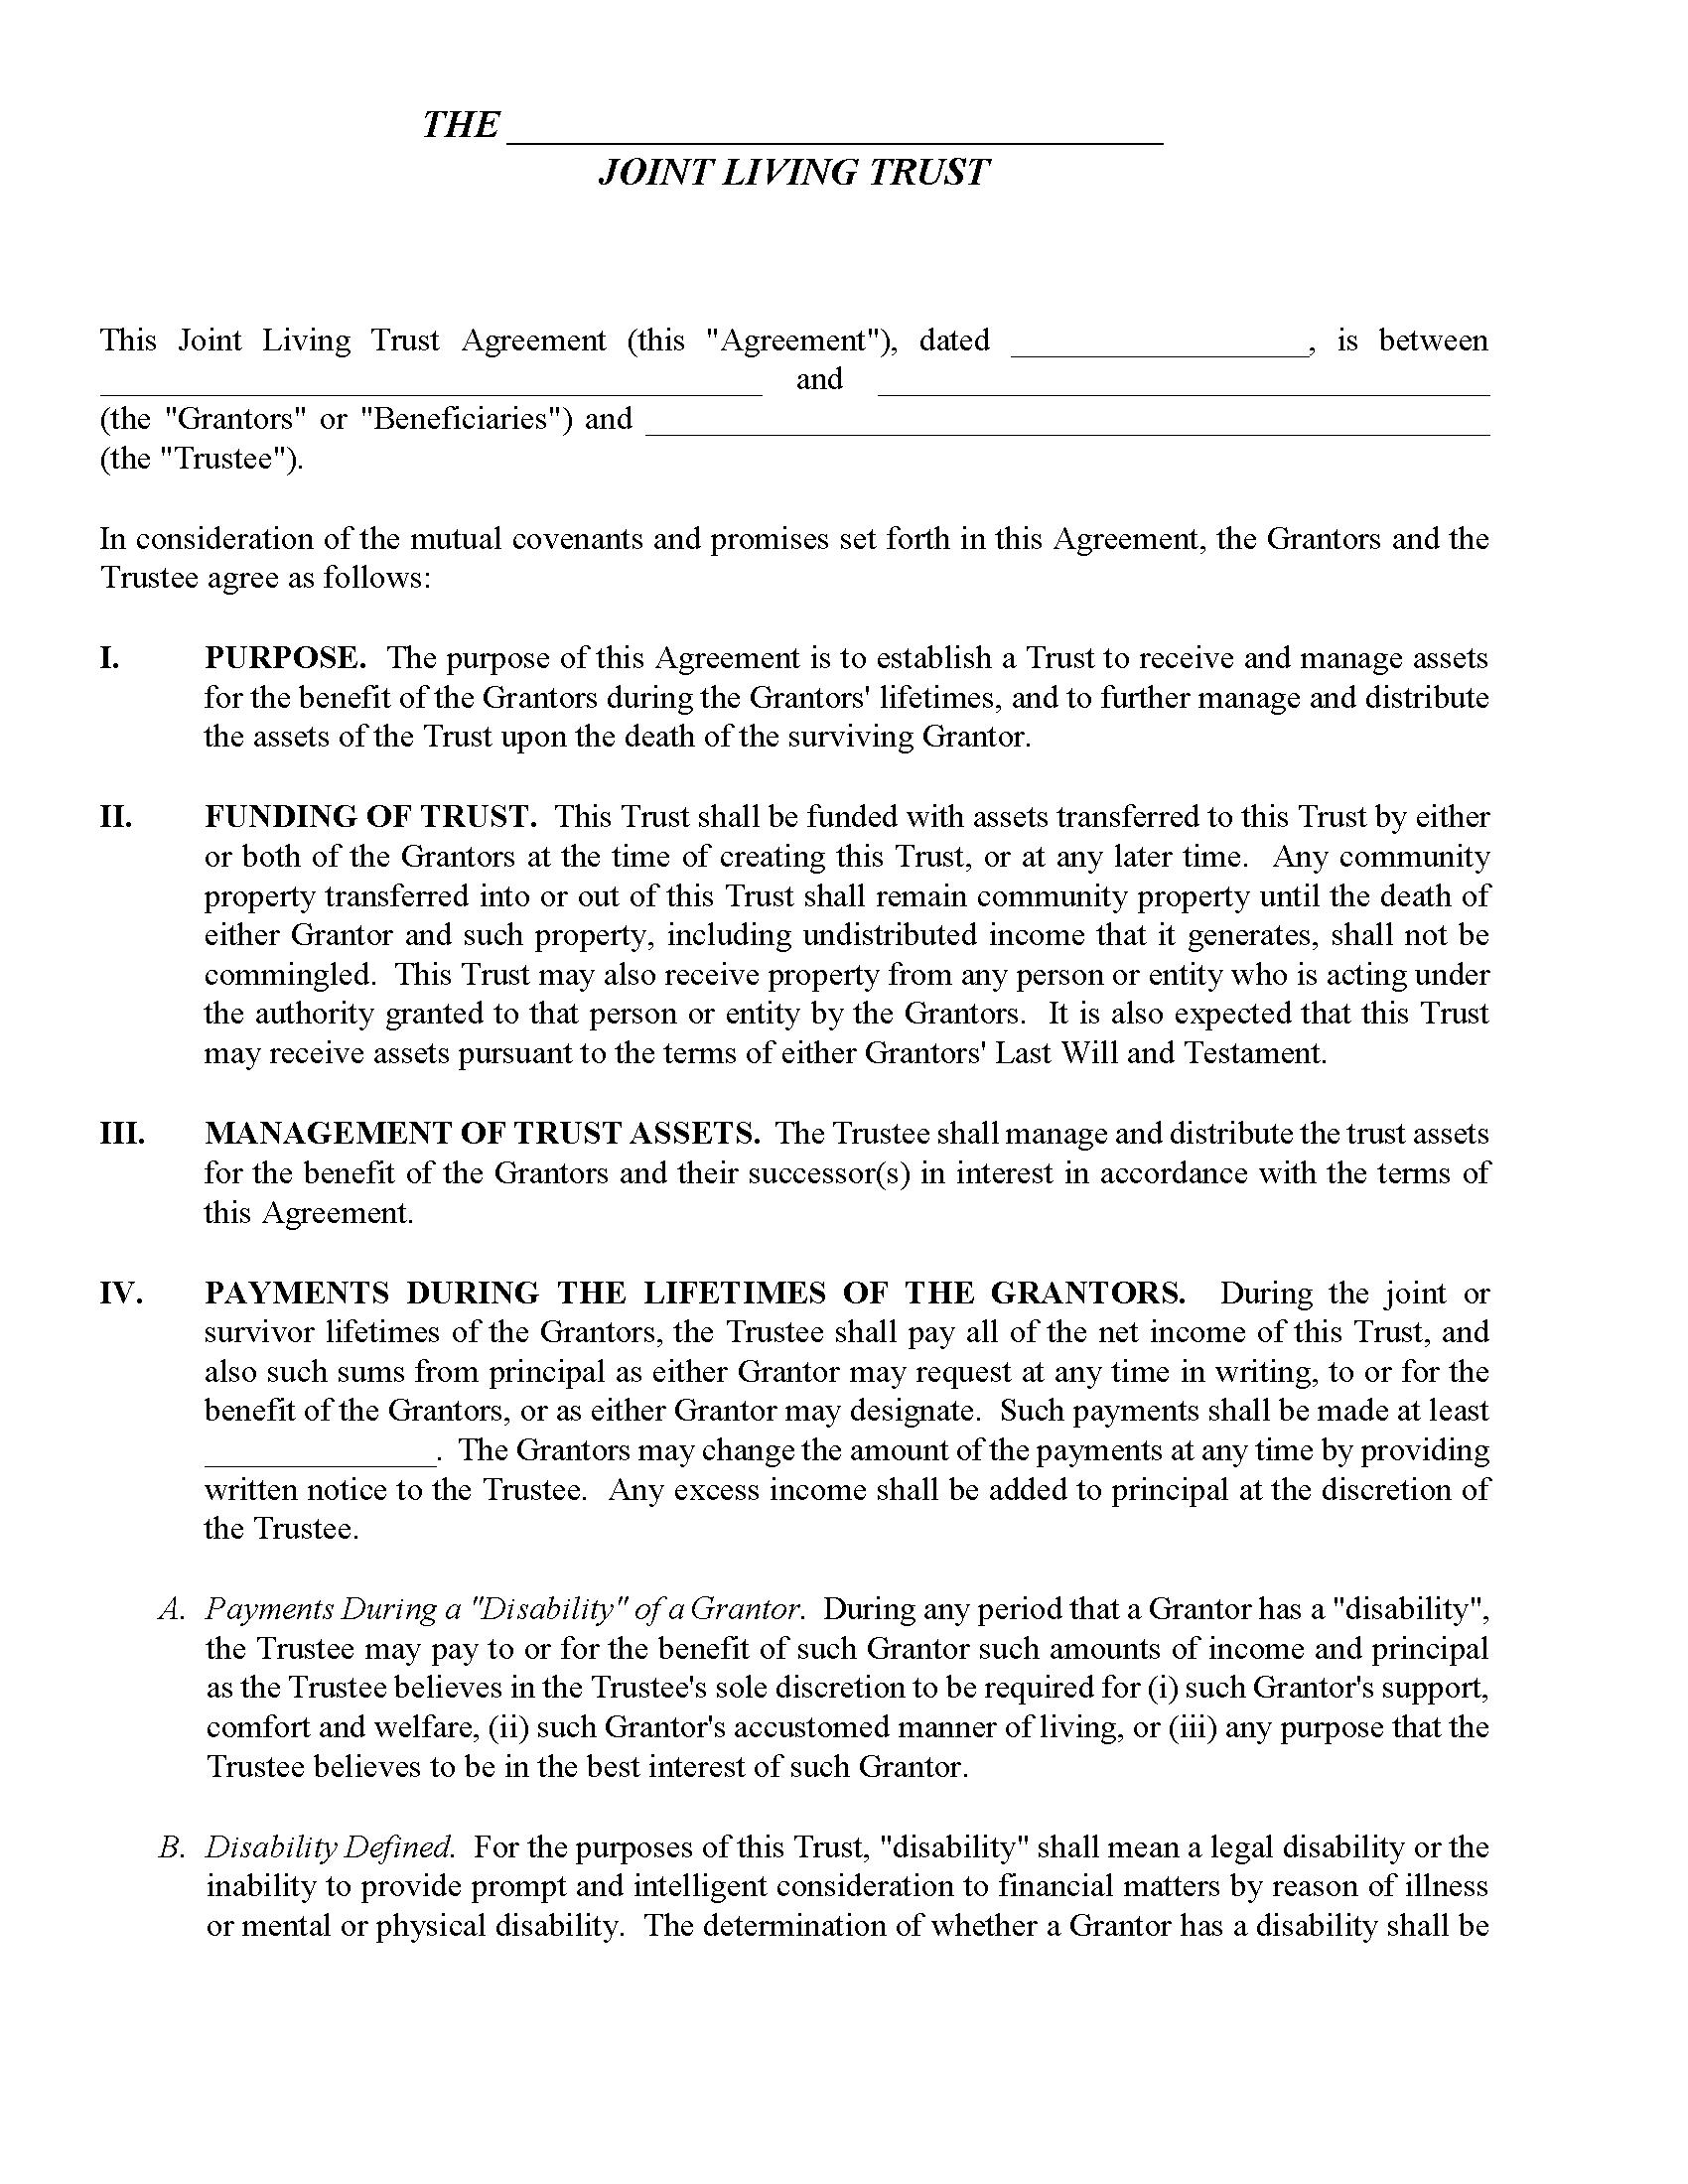 Rhode Island Joint Living Trust Form